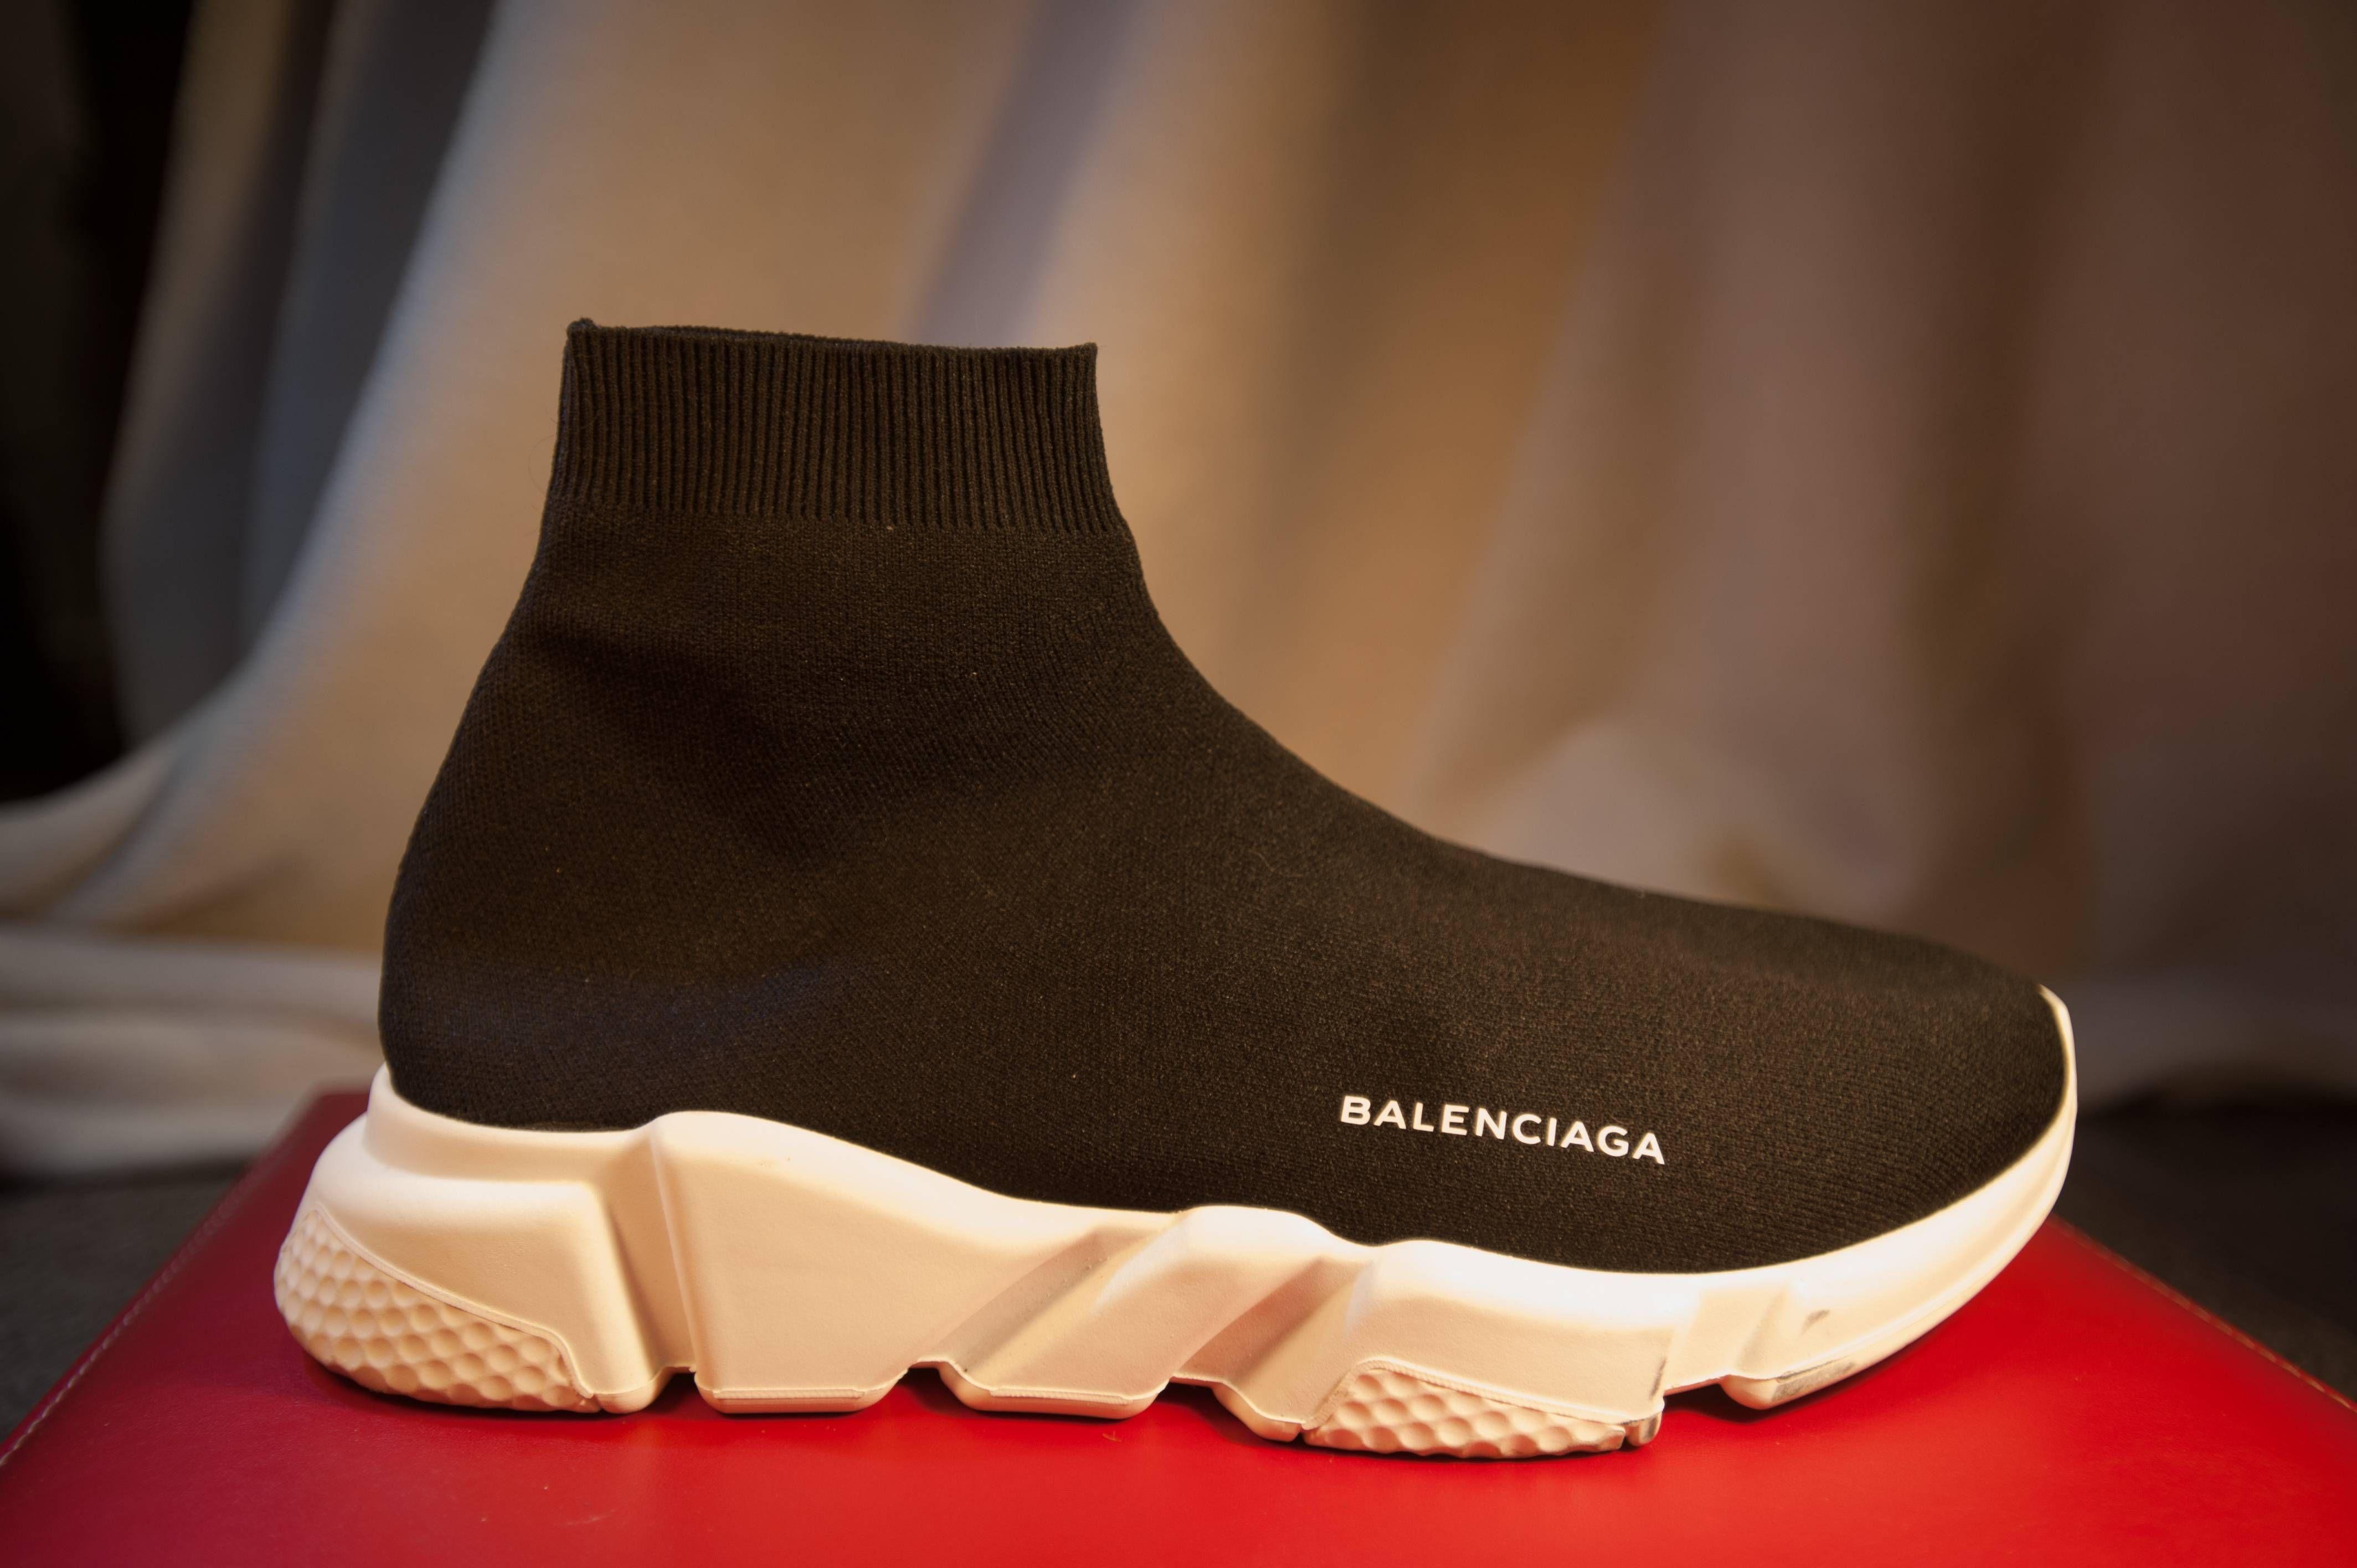 [LC] Balenciaga speed trainers Belugas Kith x Adidas